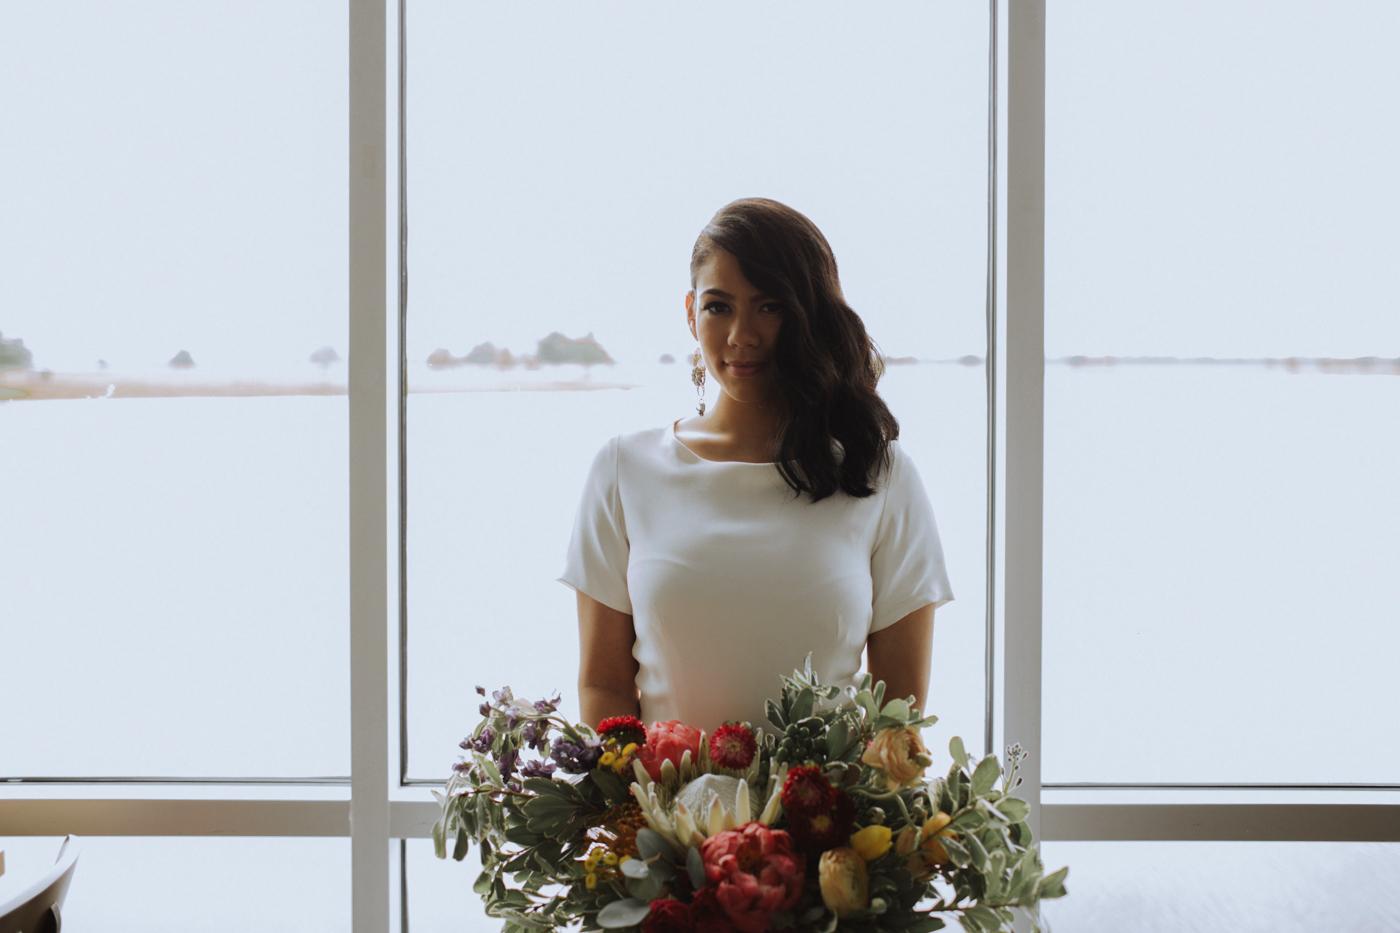 Wedding | Canvas Market | Lake Nona-Orlando, FL  | Vanessa Boy Photography | vanessaboy.com-171.com |Green Wedding Shoes.jpg